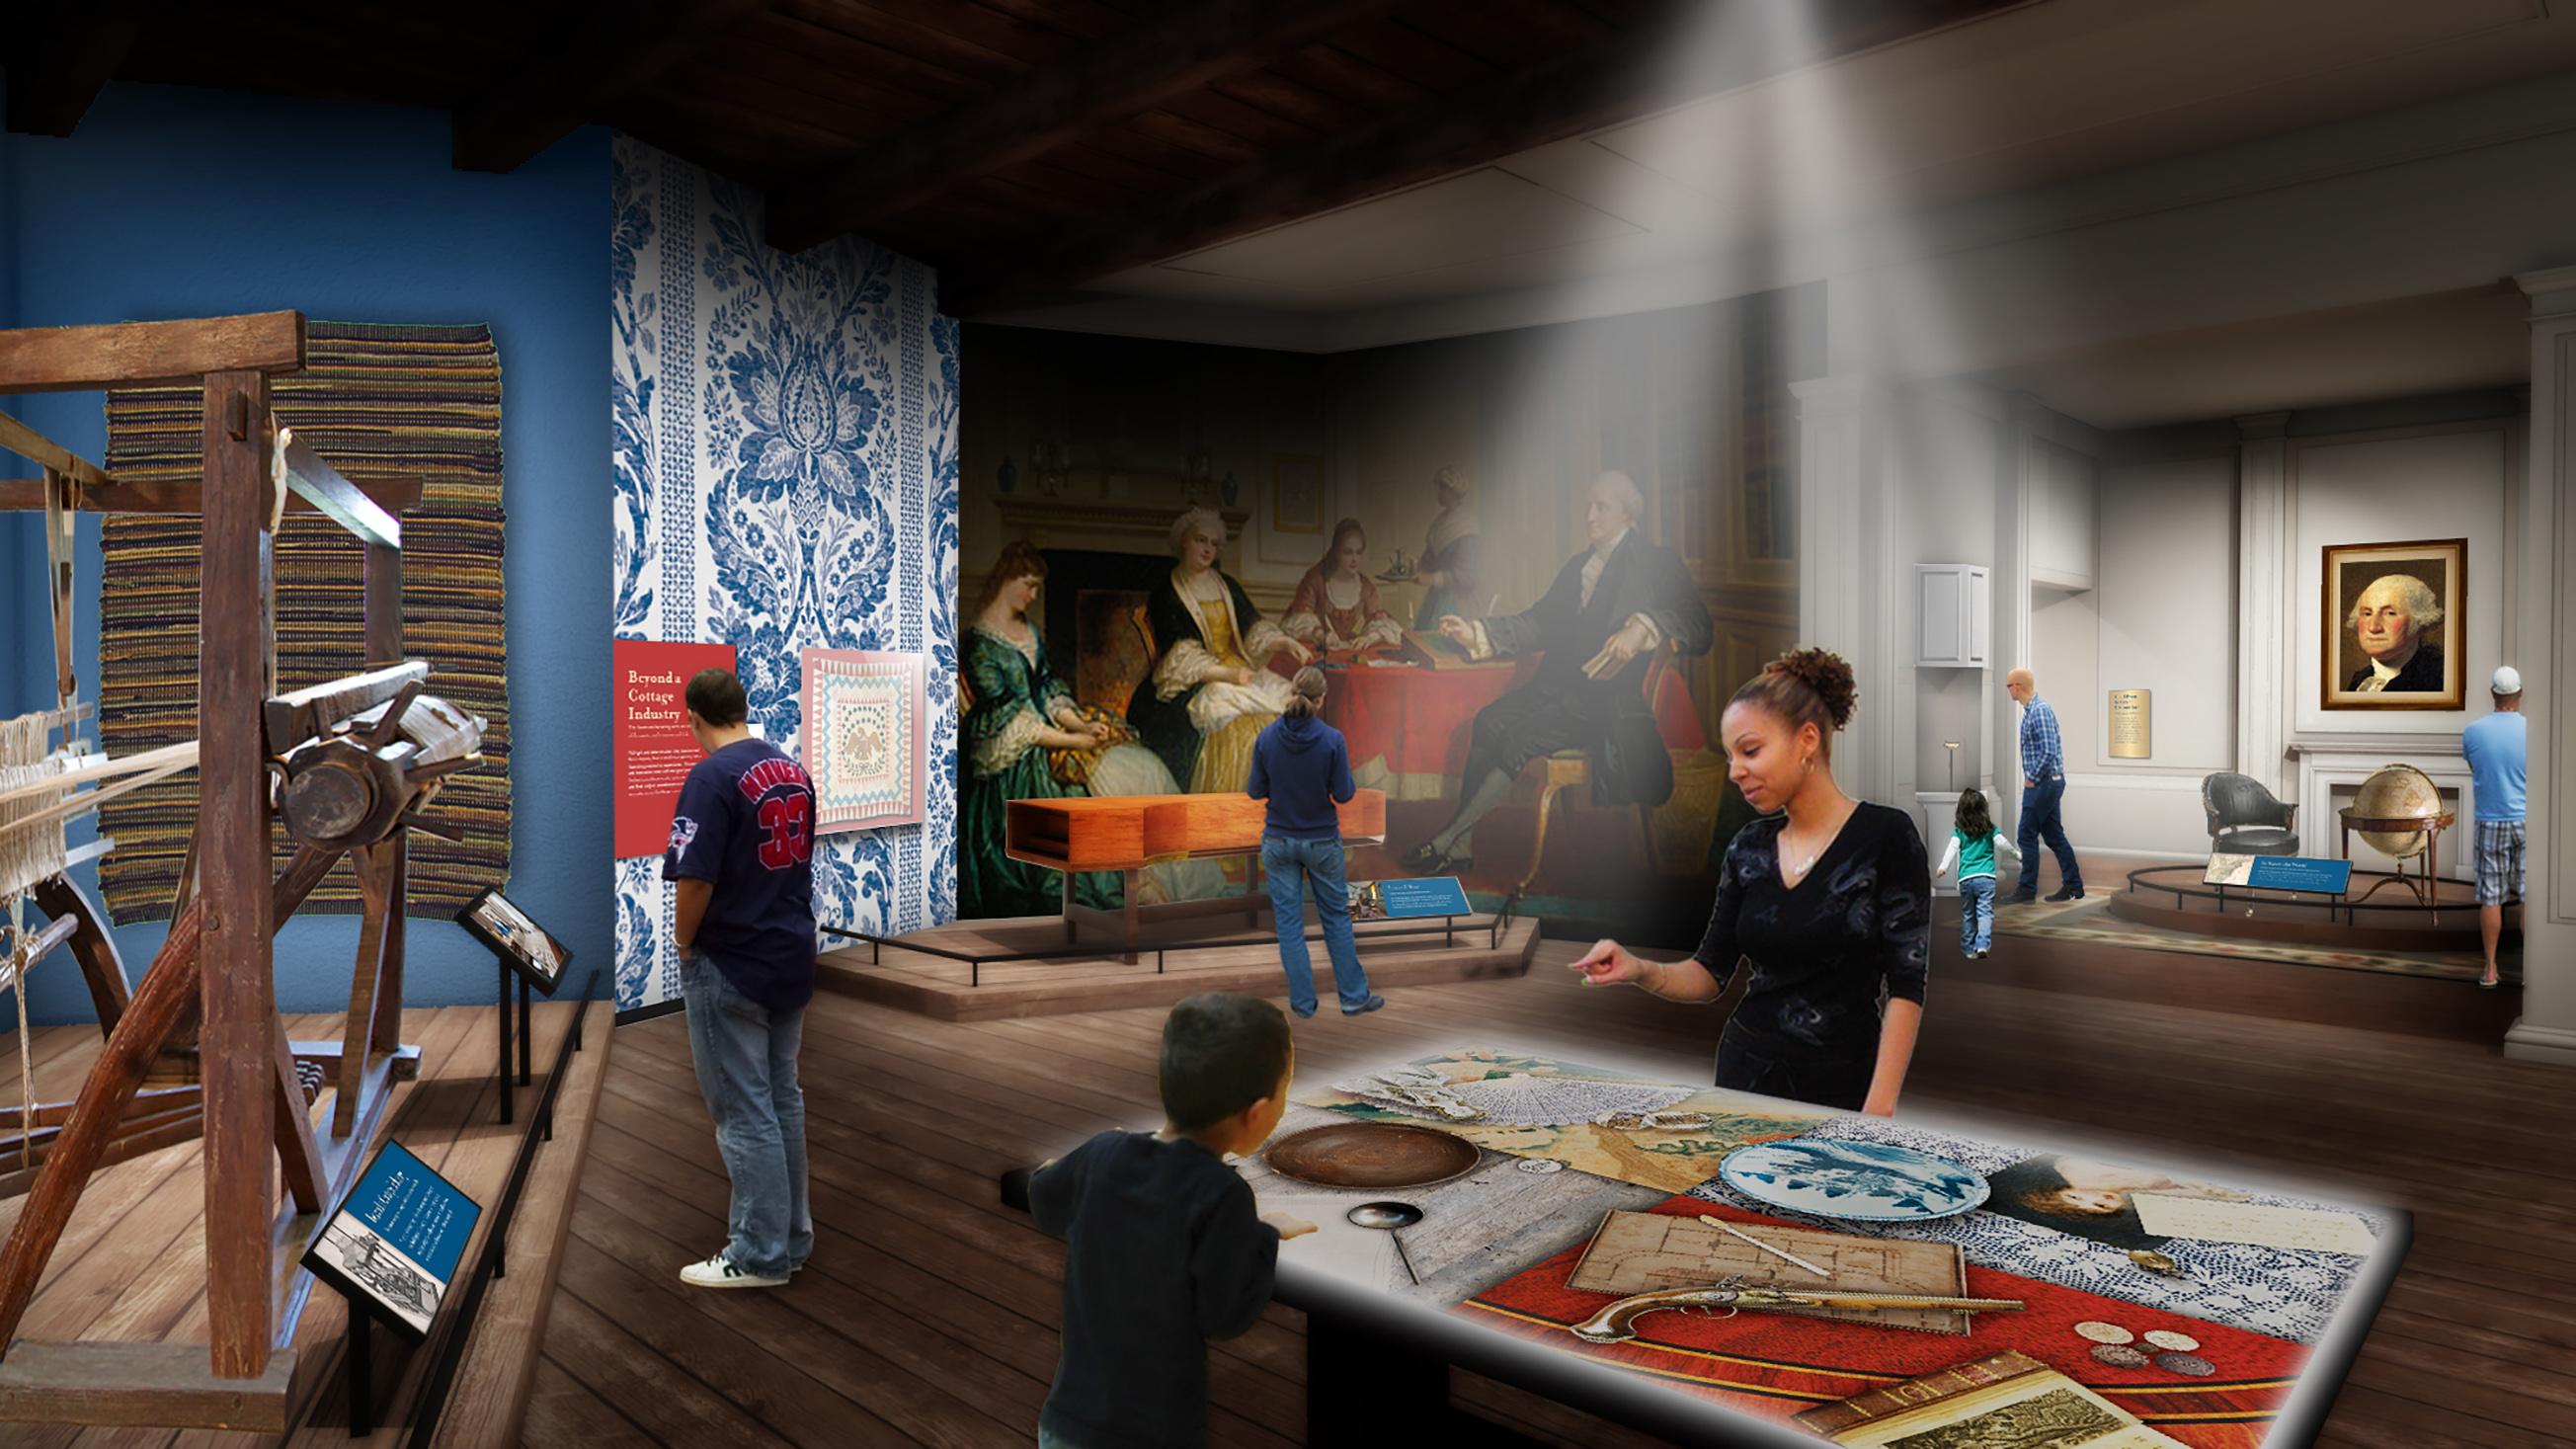 Mount Vernon Estate Orientation Center Gallery Concept: Life at Mount Vernon